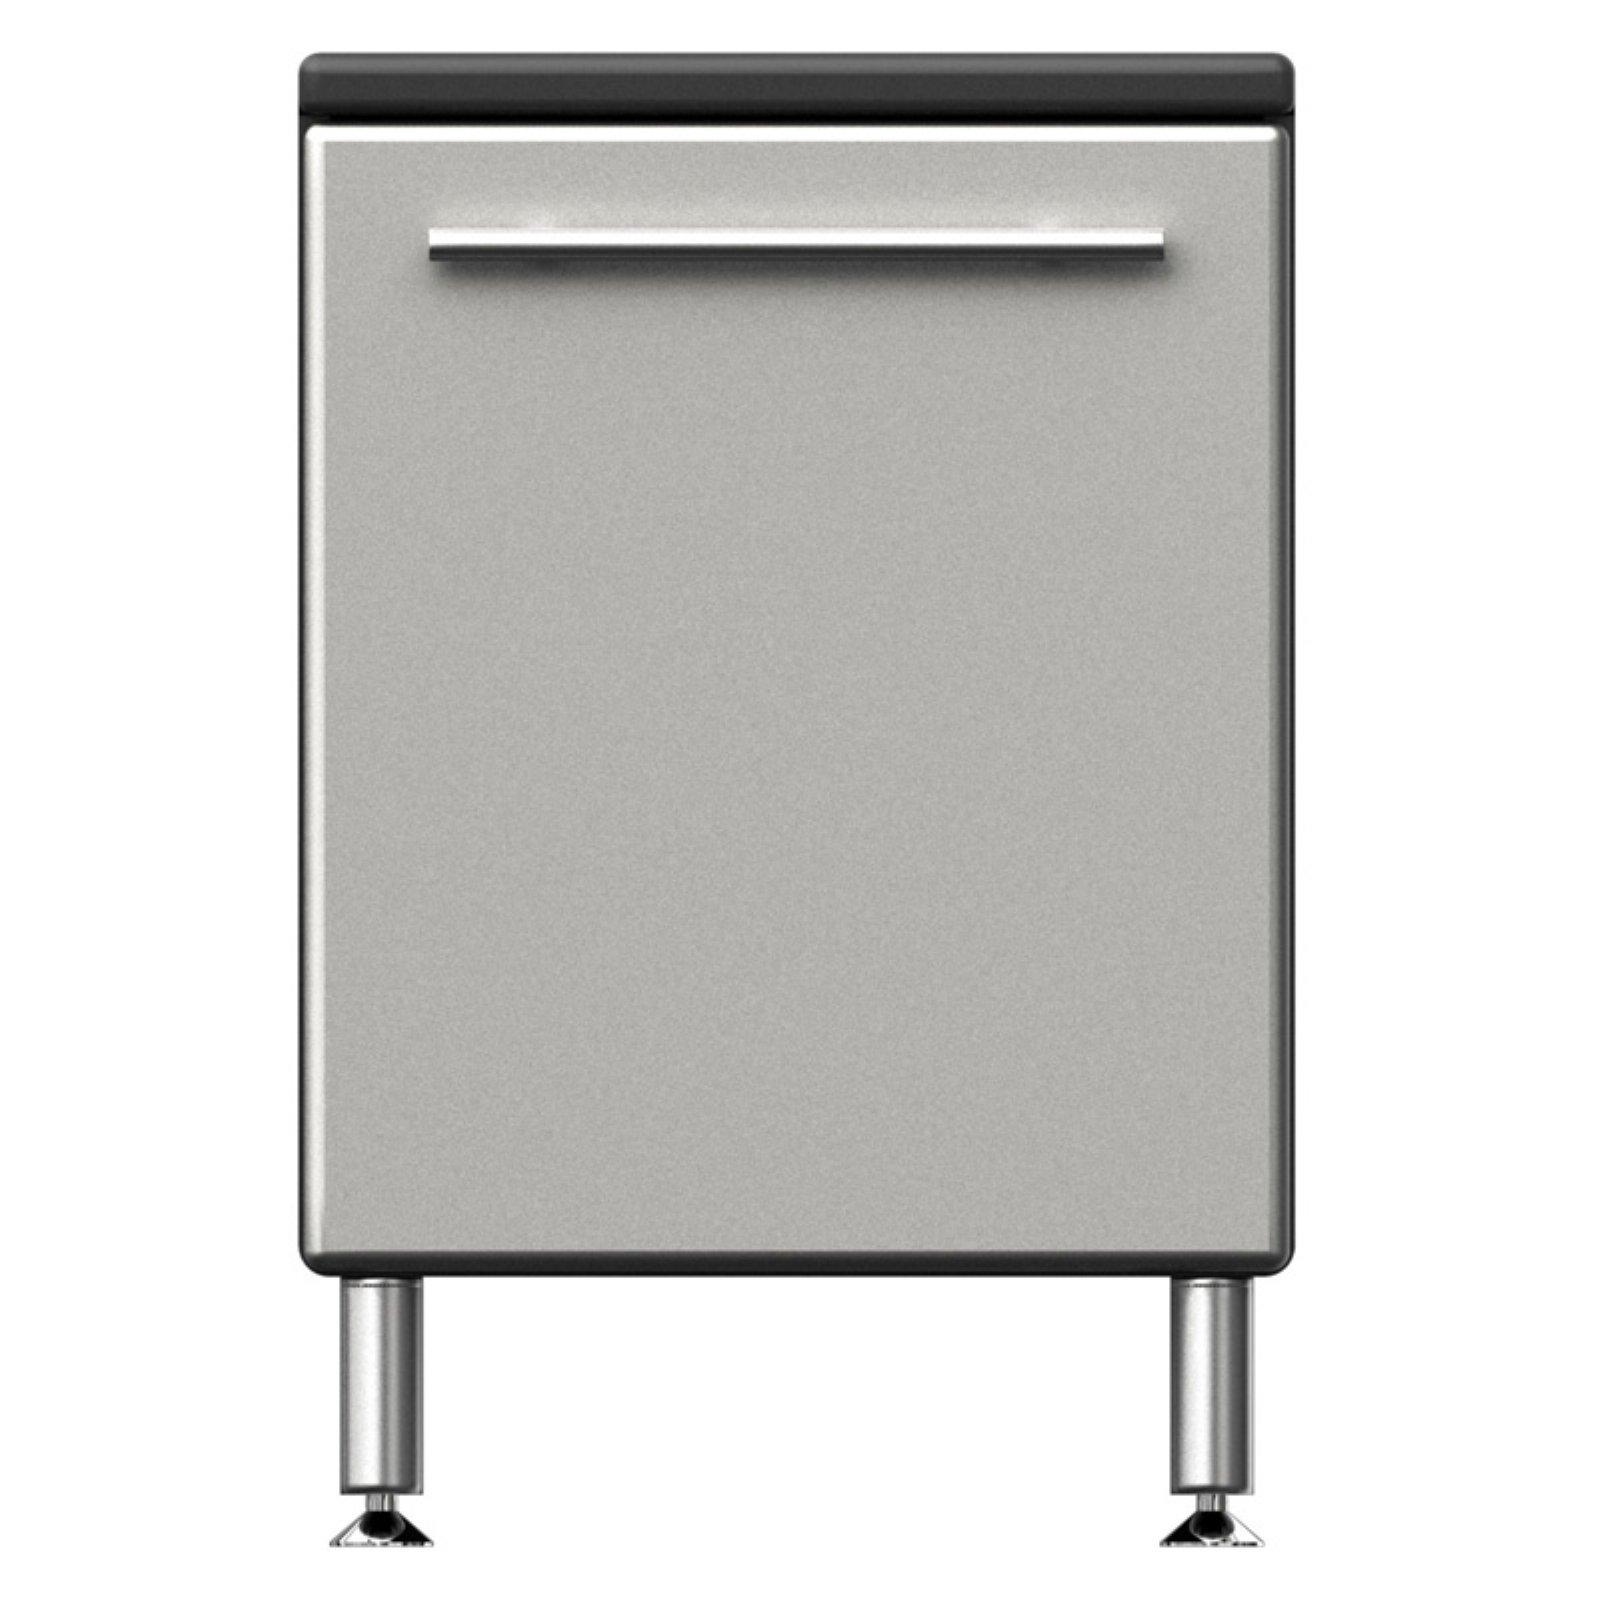 Ulti-MATE PRO 23.6 in. Garage Base Cabinet